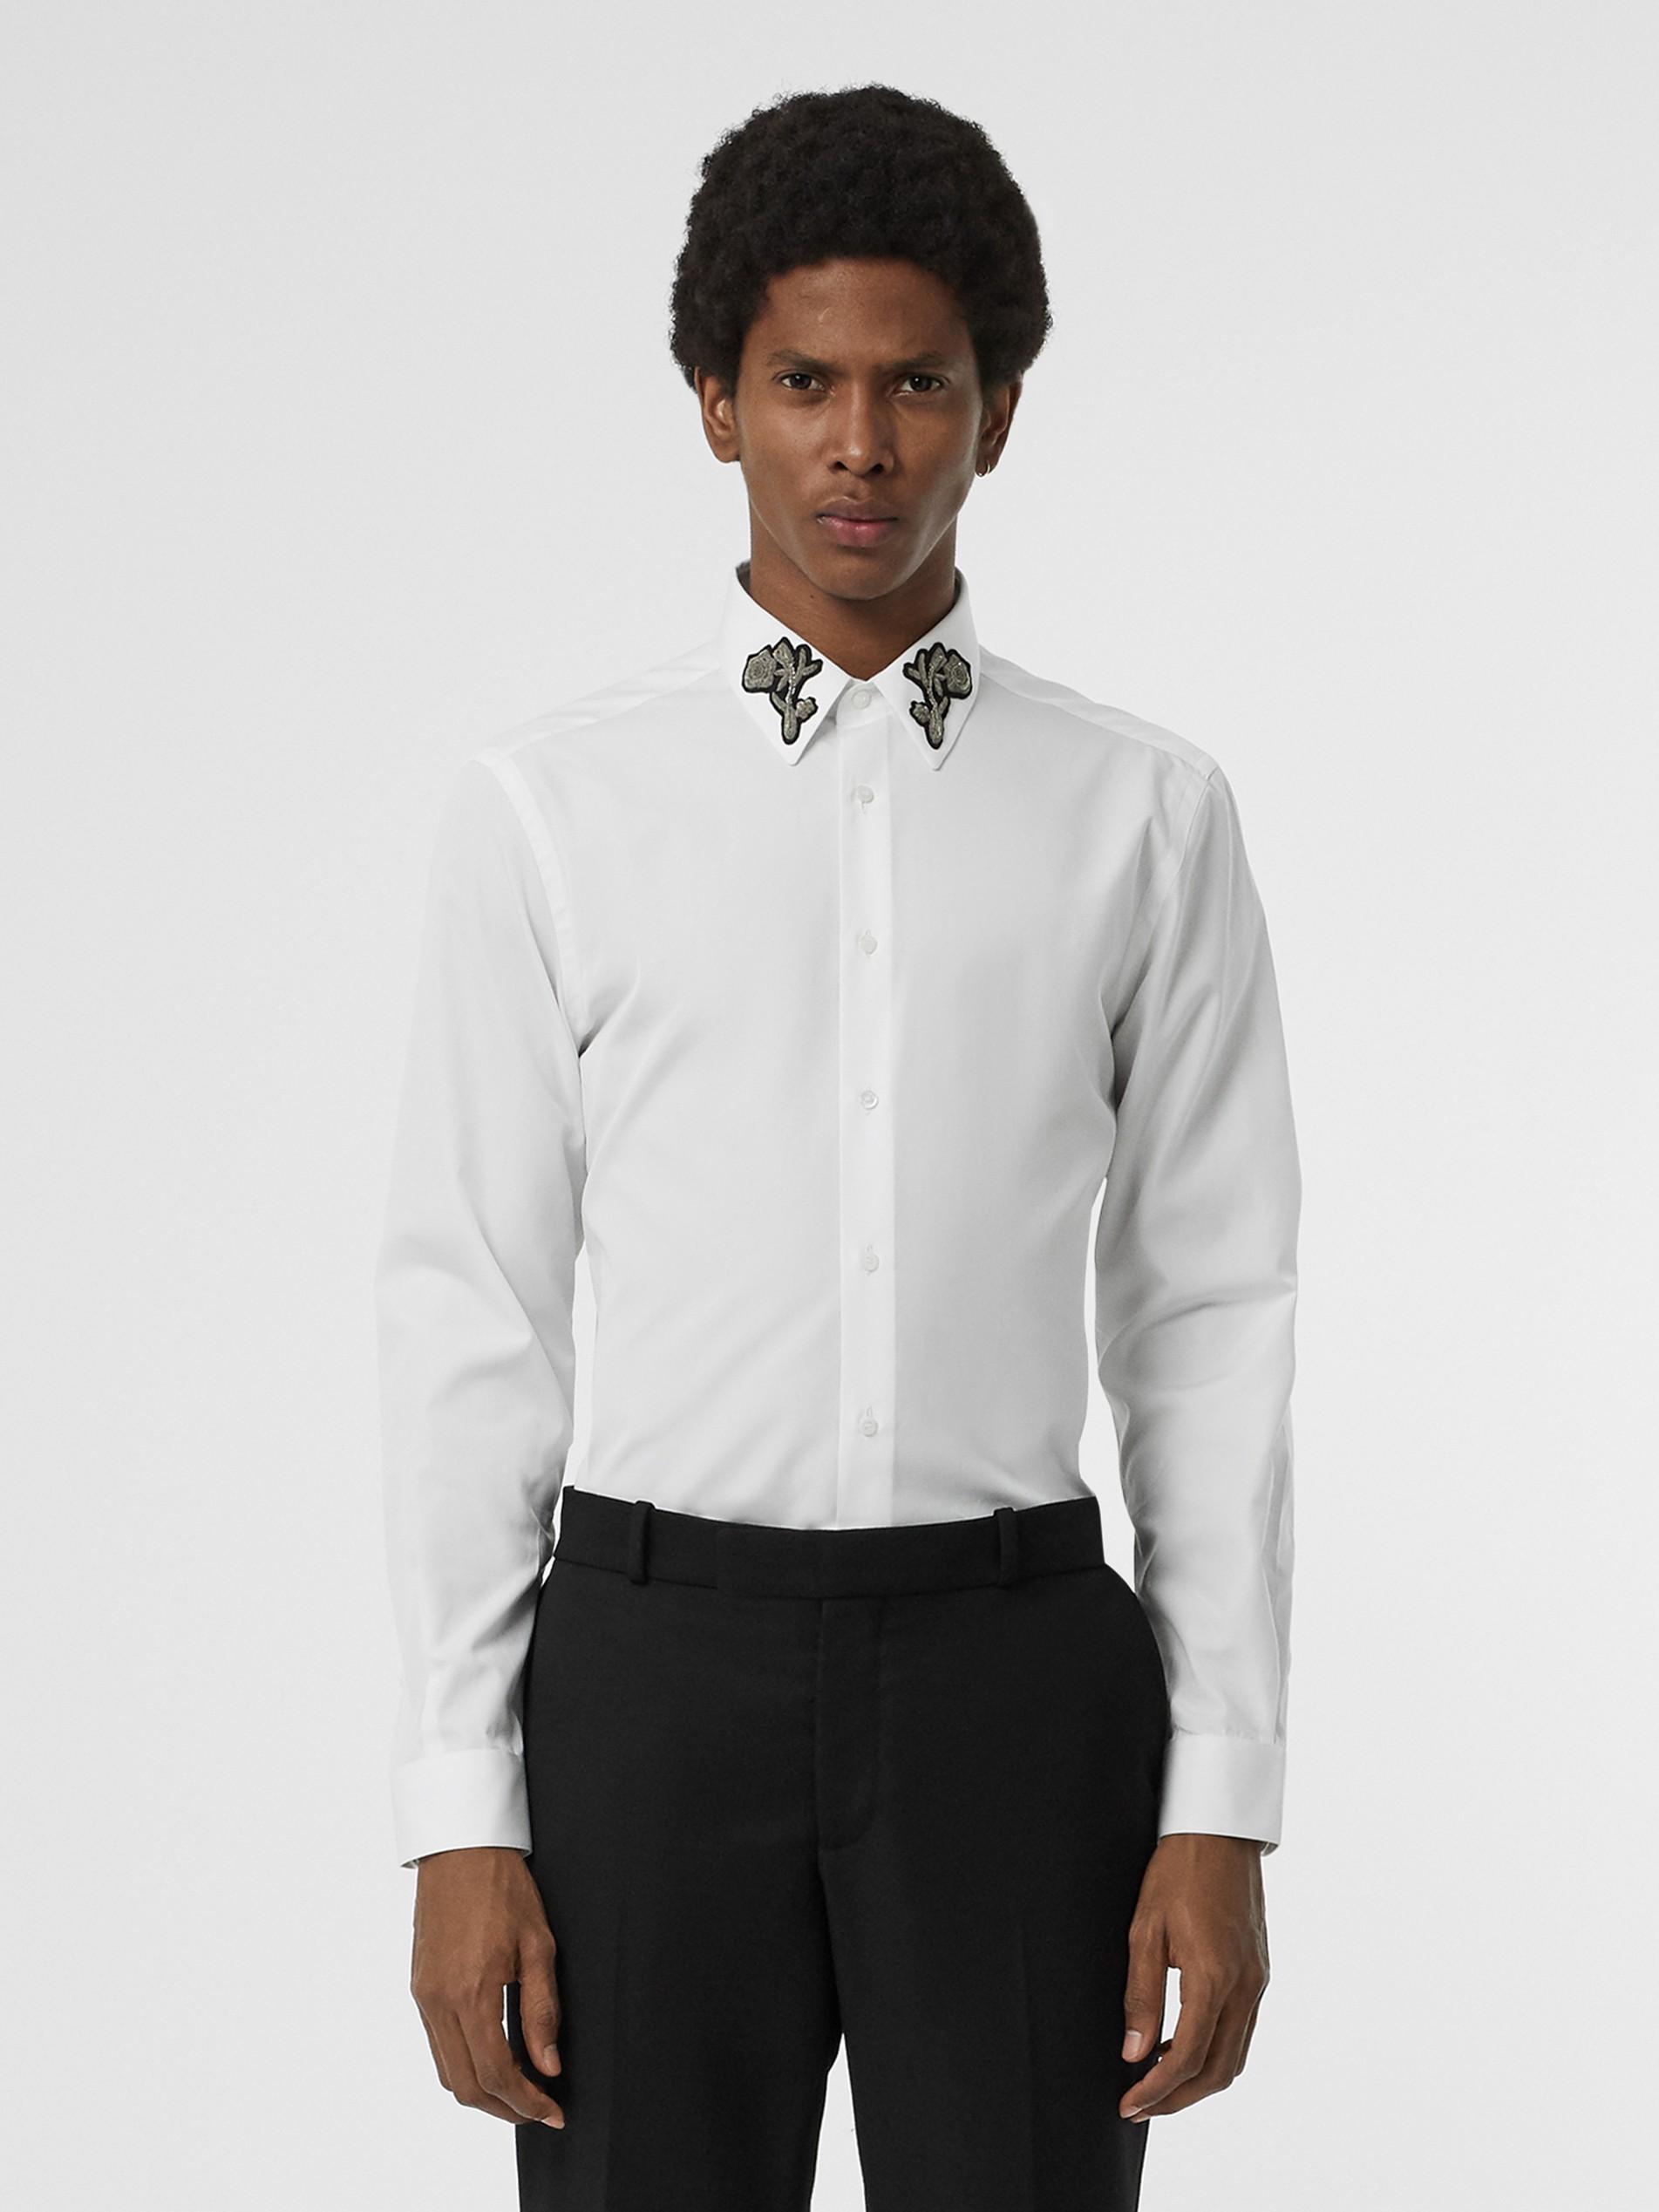 Burberry Slim Fit Bullion Floral Cotton Poplin Dress Shirt In White